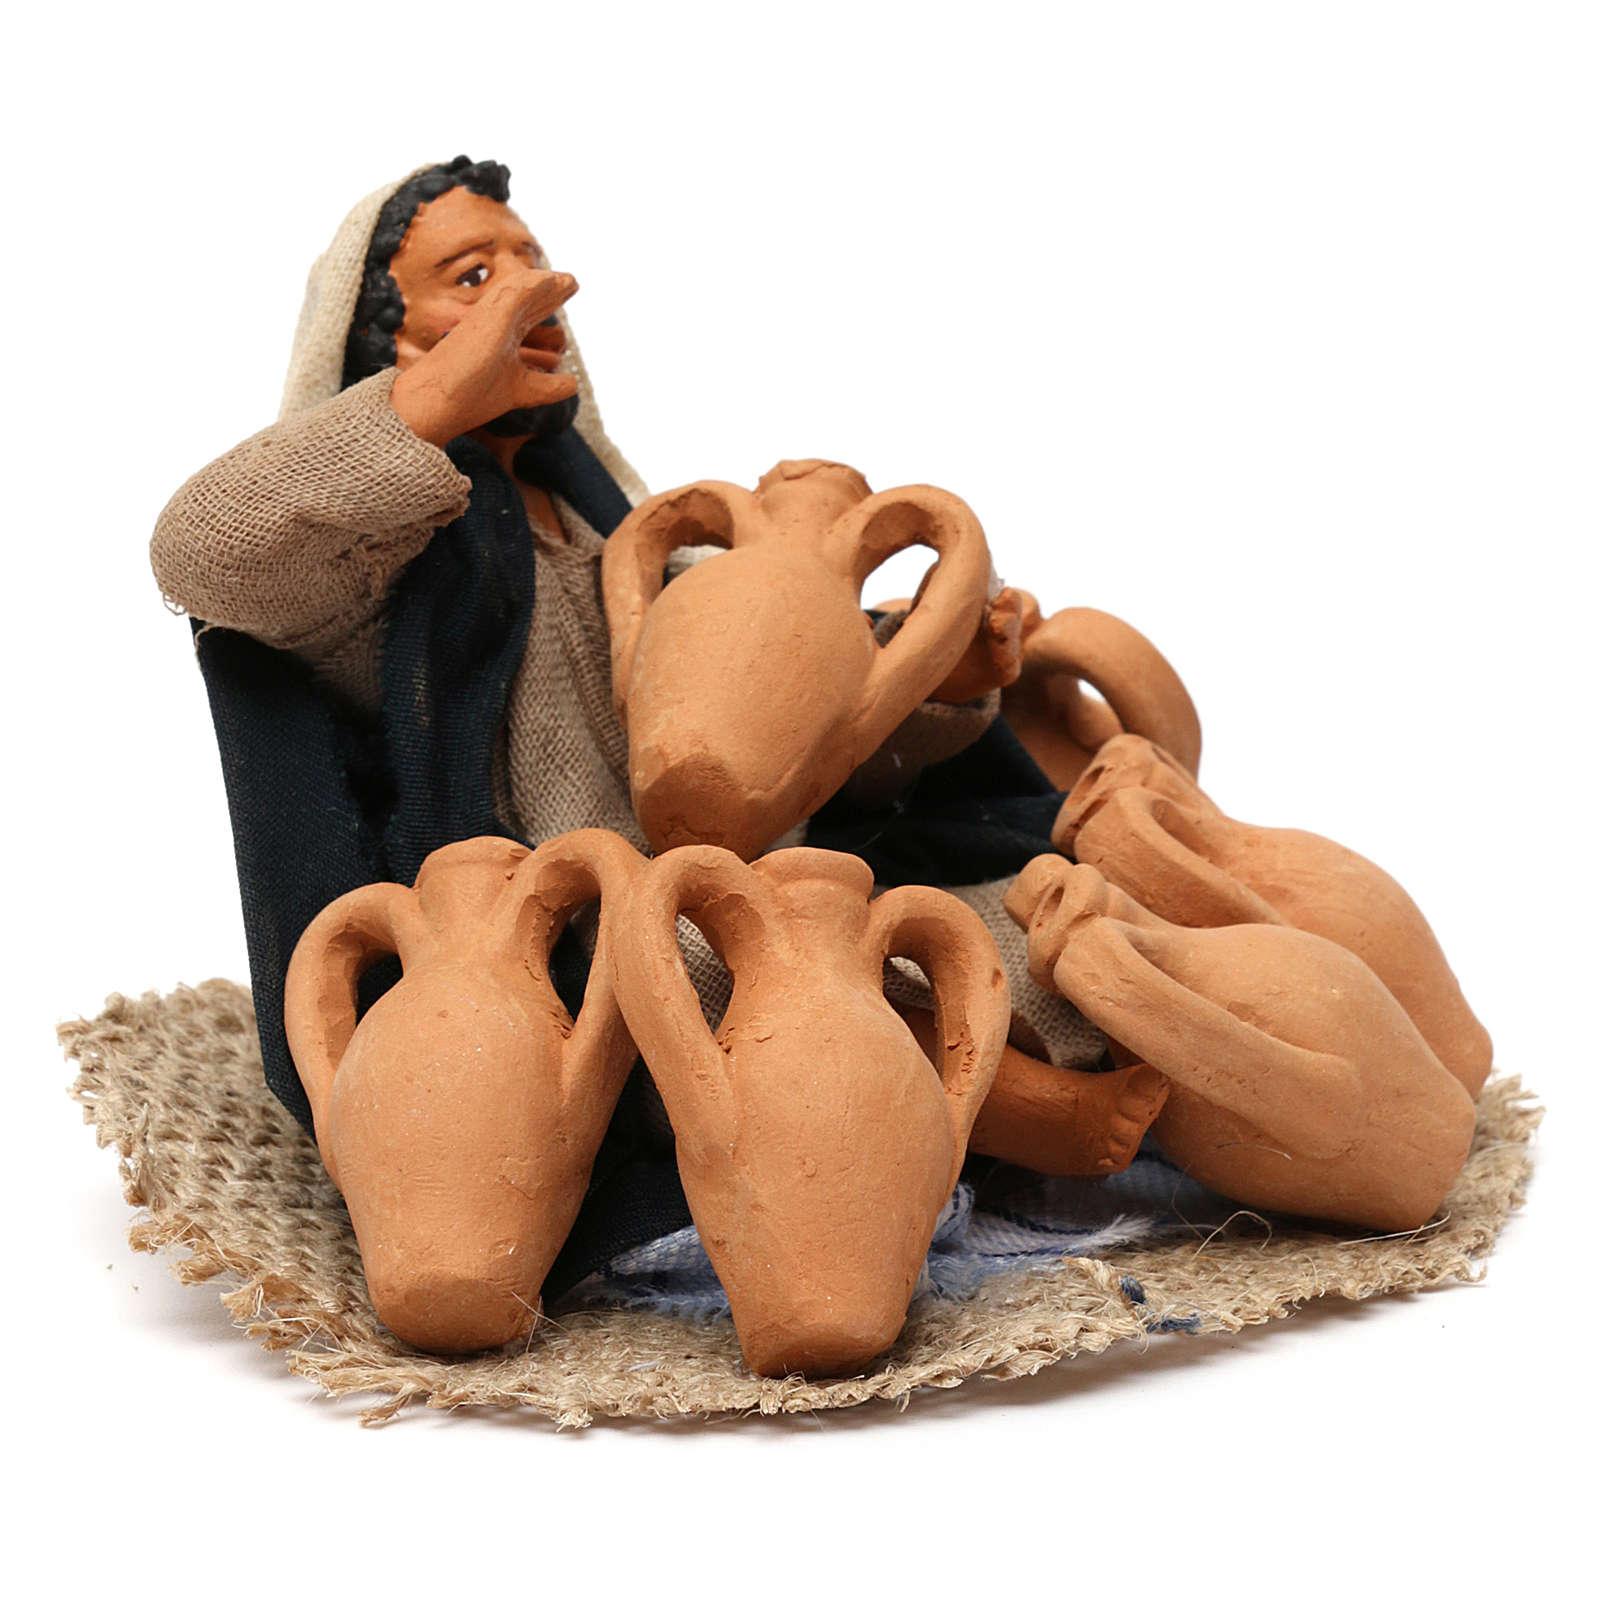 Arabian man with amphorae, Neapolitan Nativity 12cm 4